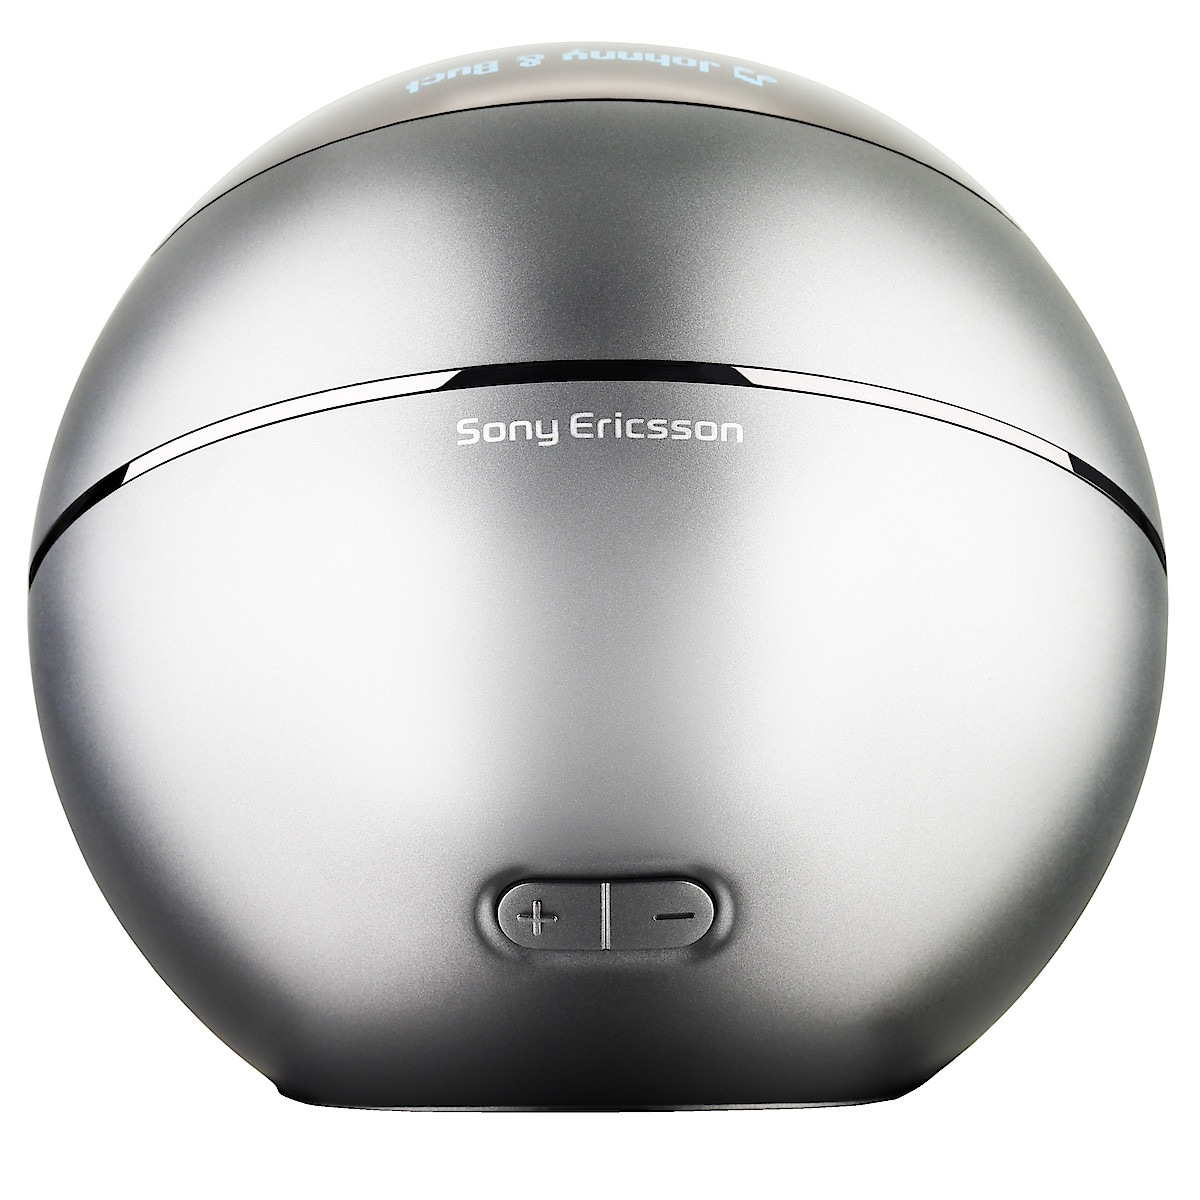 Trådløse Bluetooth-høyttalere Sony Ericsson MBS-200